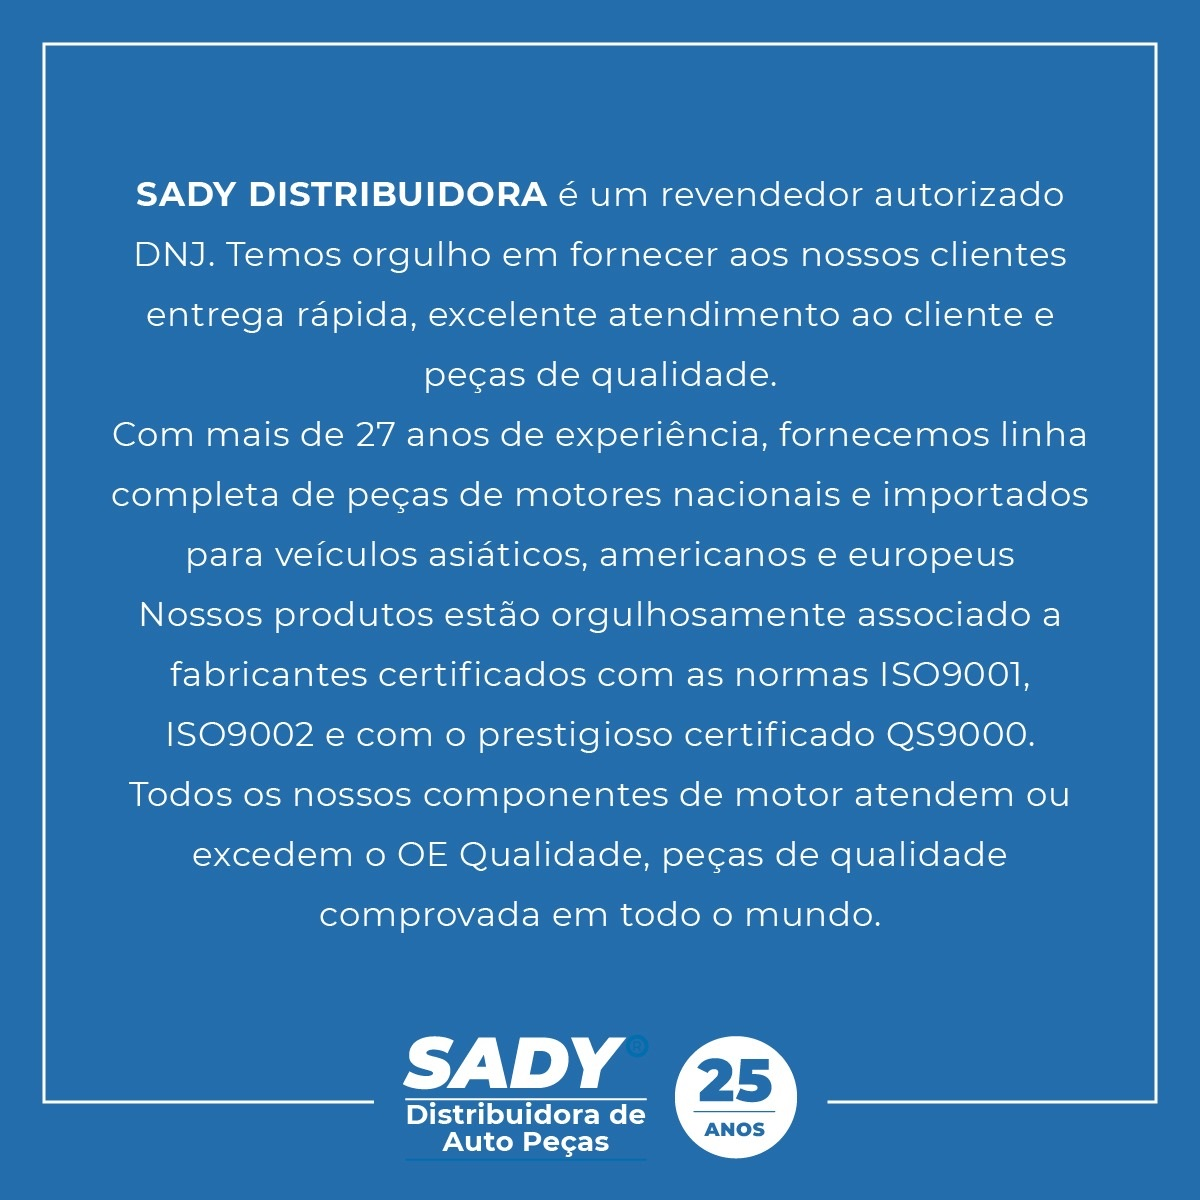 BOMBA DE OLEO DO MOTOR INFINIT 4.5 V8 32V